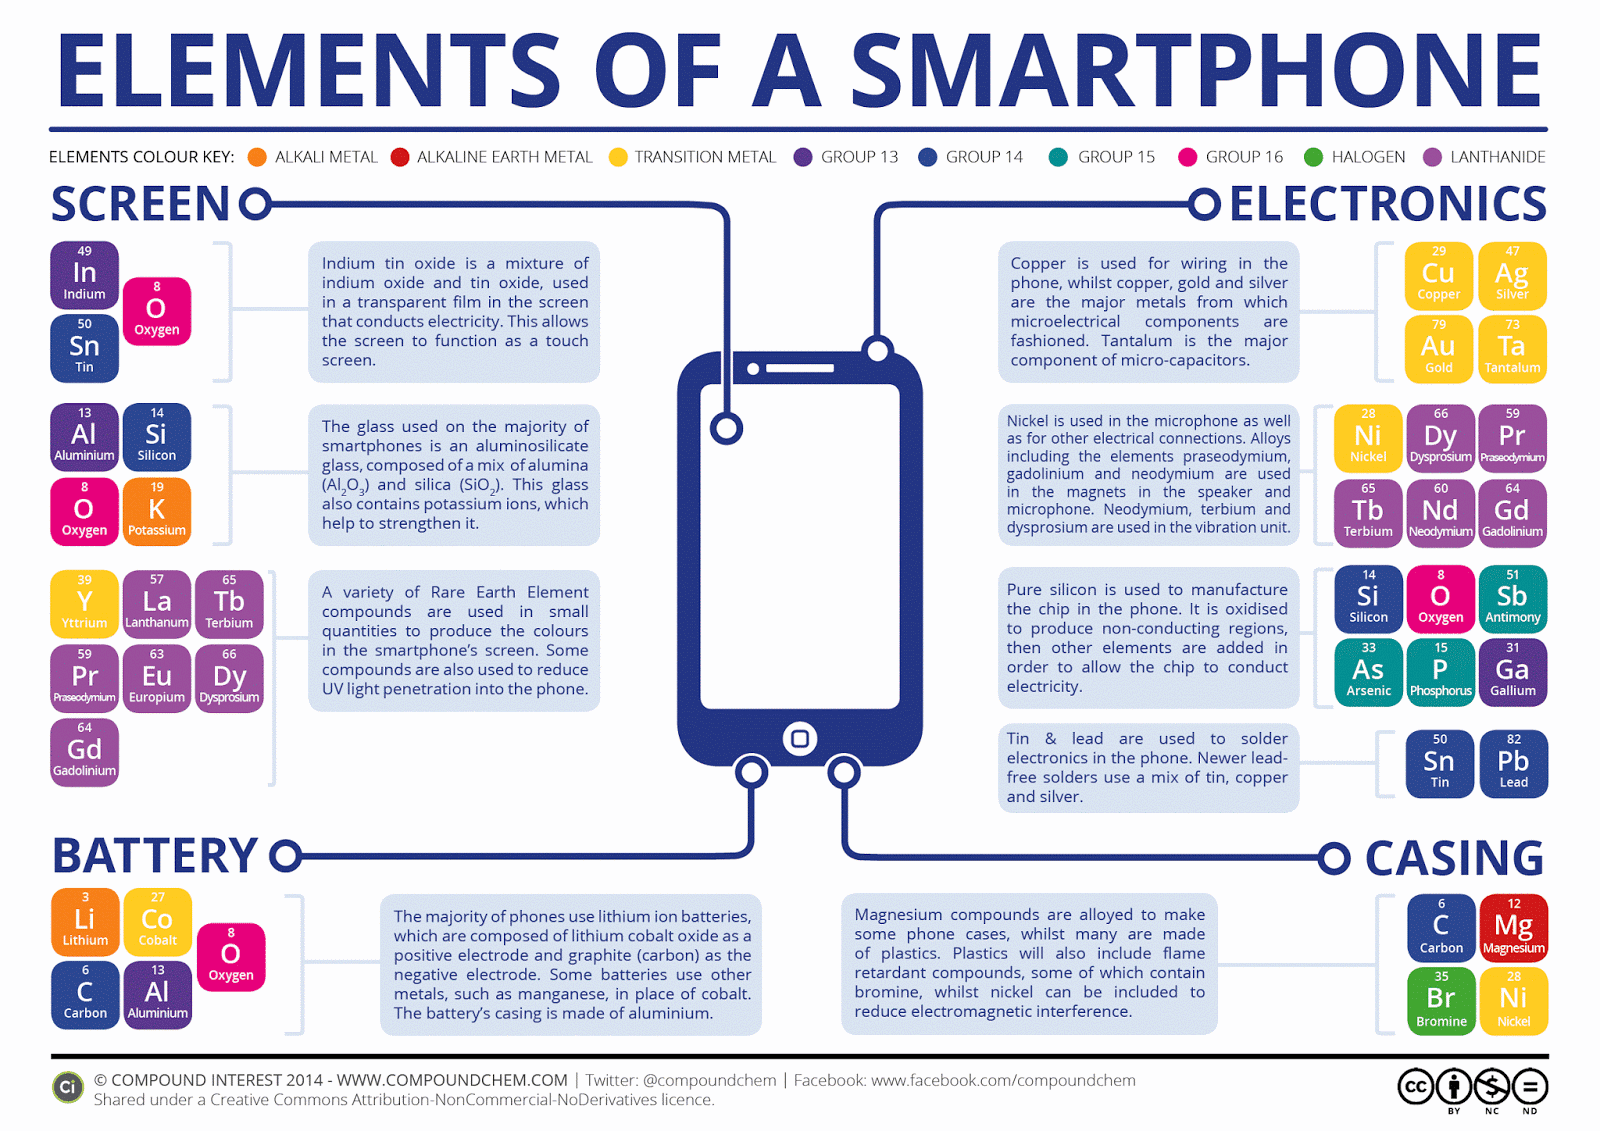 The Chemical Elements of a Smartphone v2 - Los minerales en tu teléfono móvil